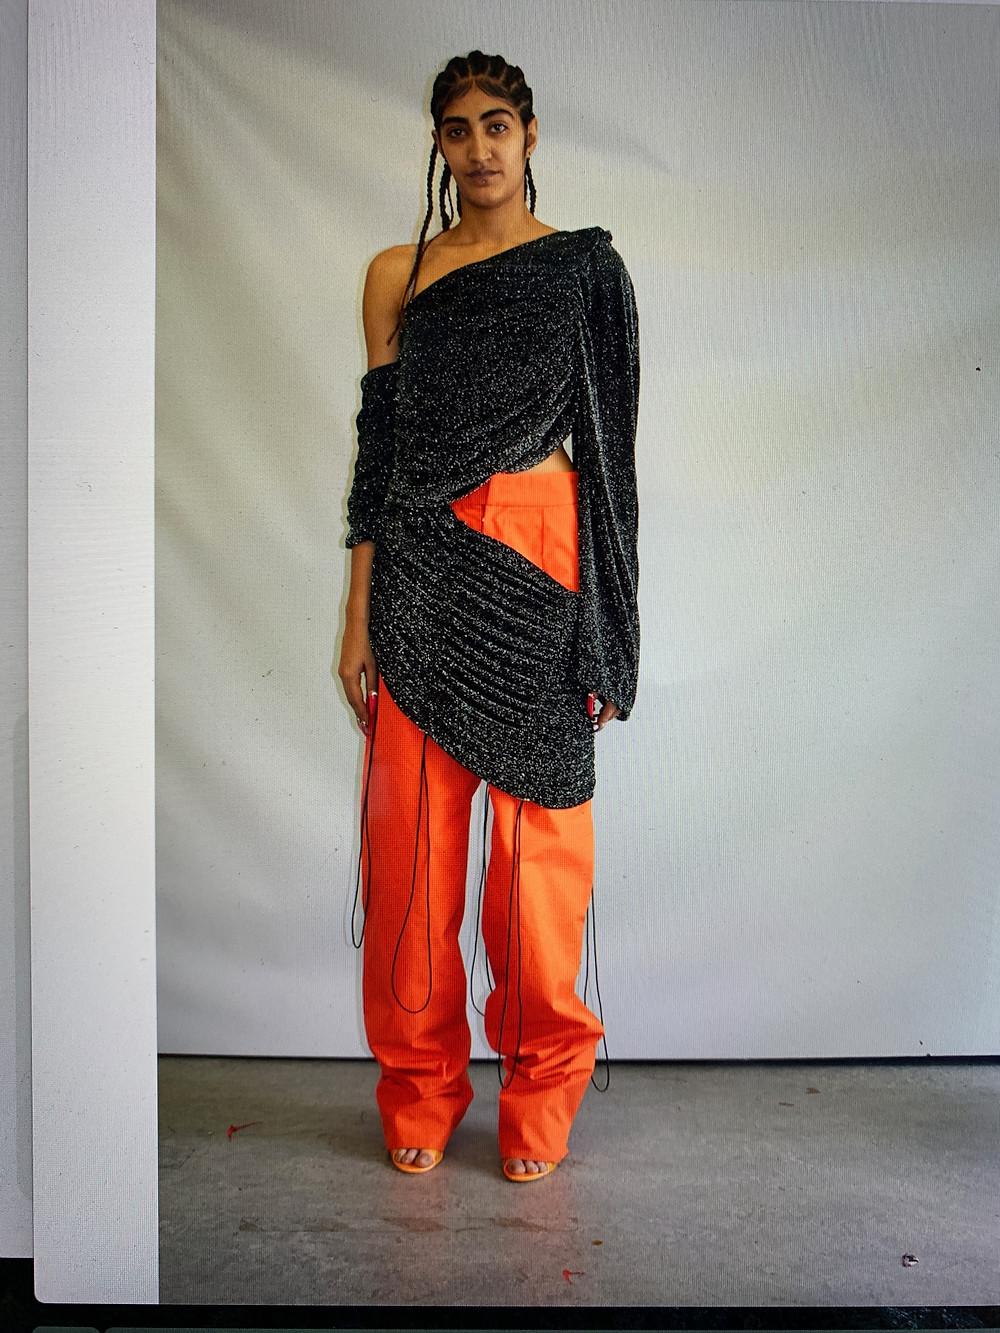 Designer Adrienne Uel